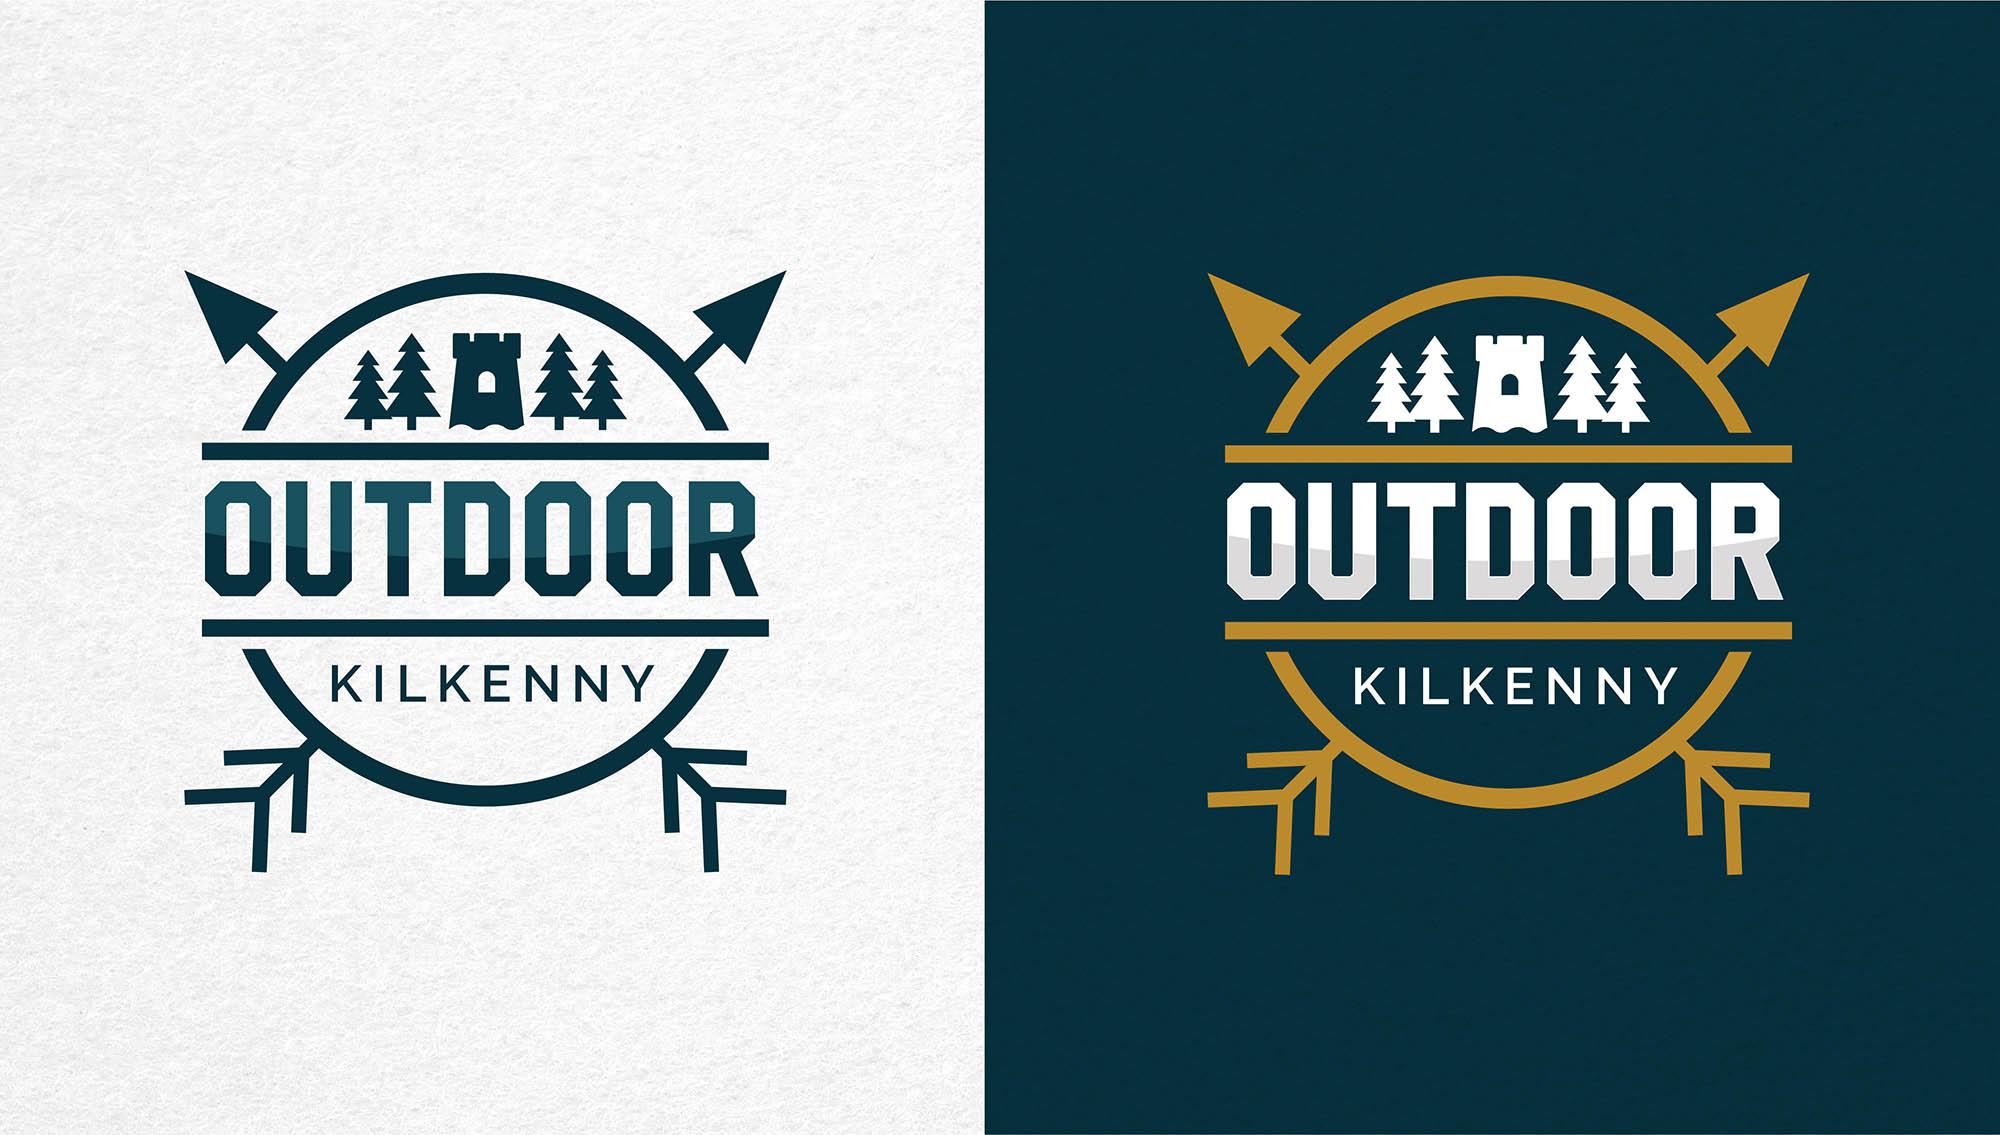 Outdoor Kilkenny Logo Design 2 01